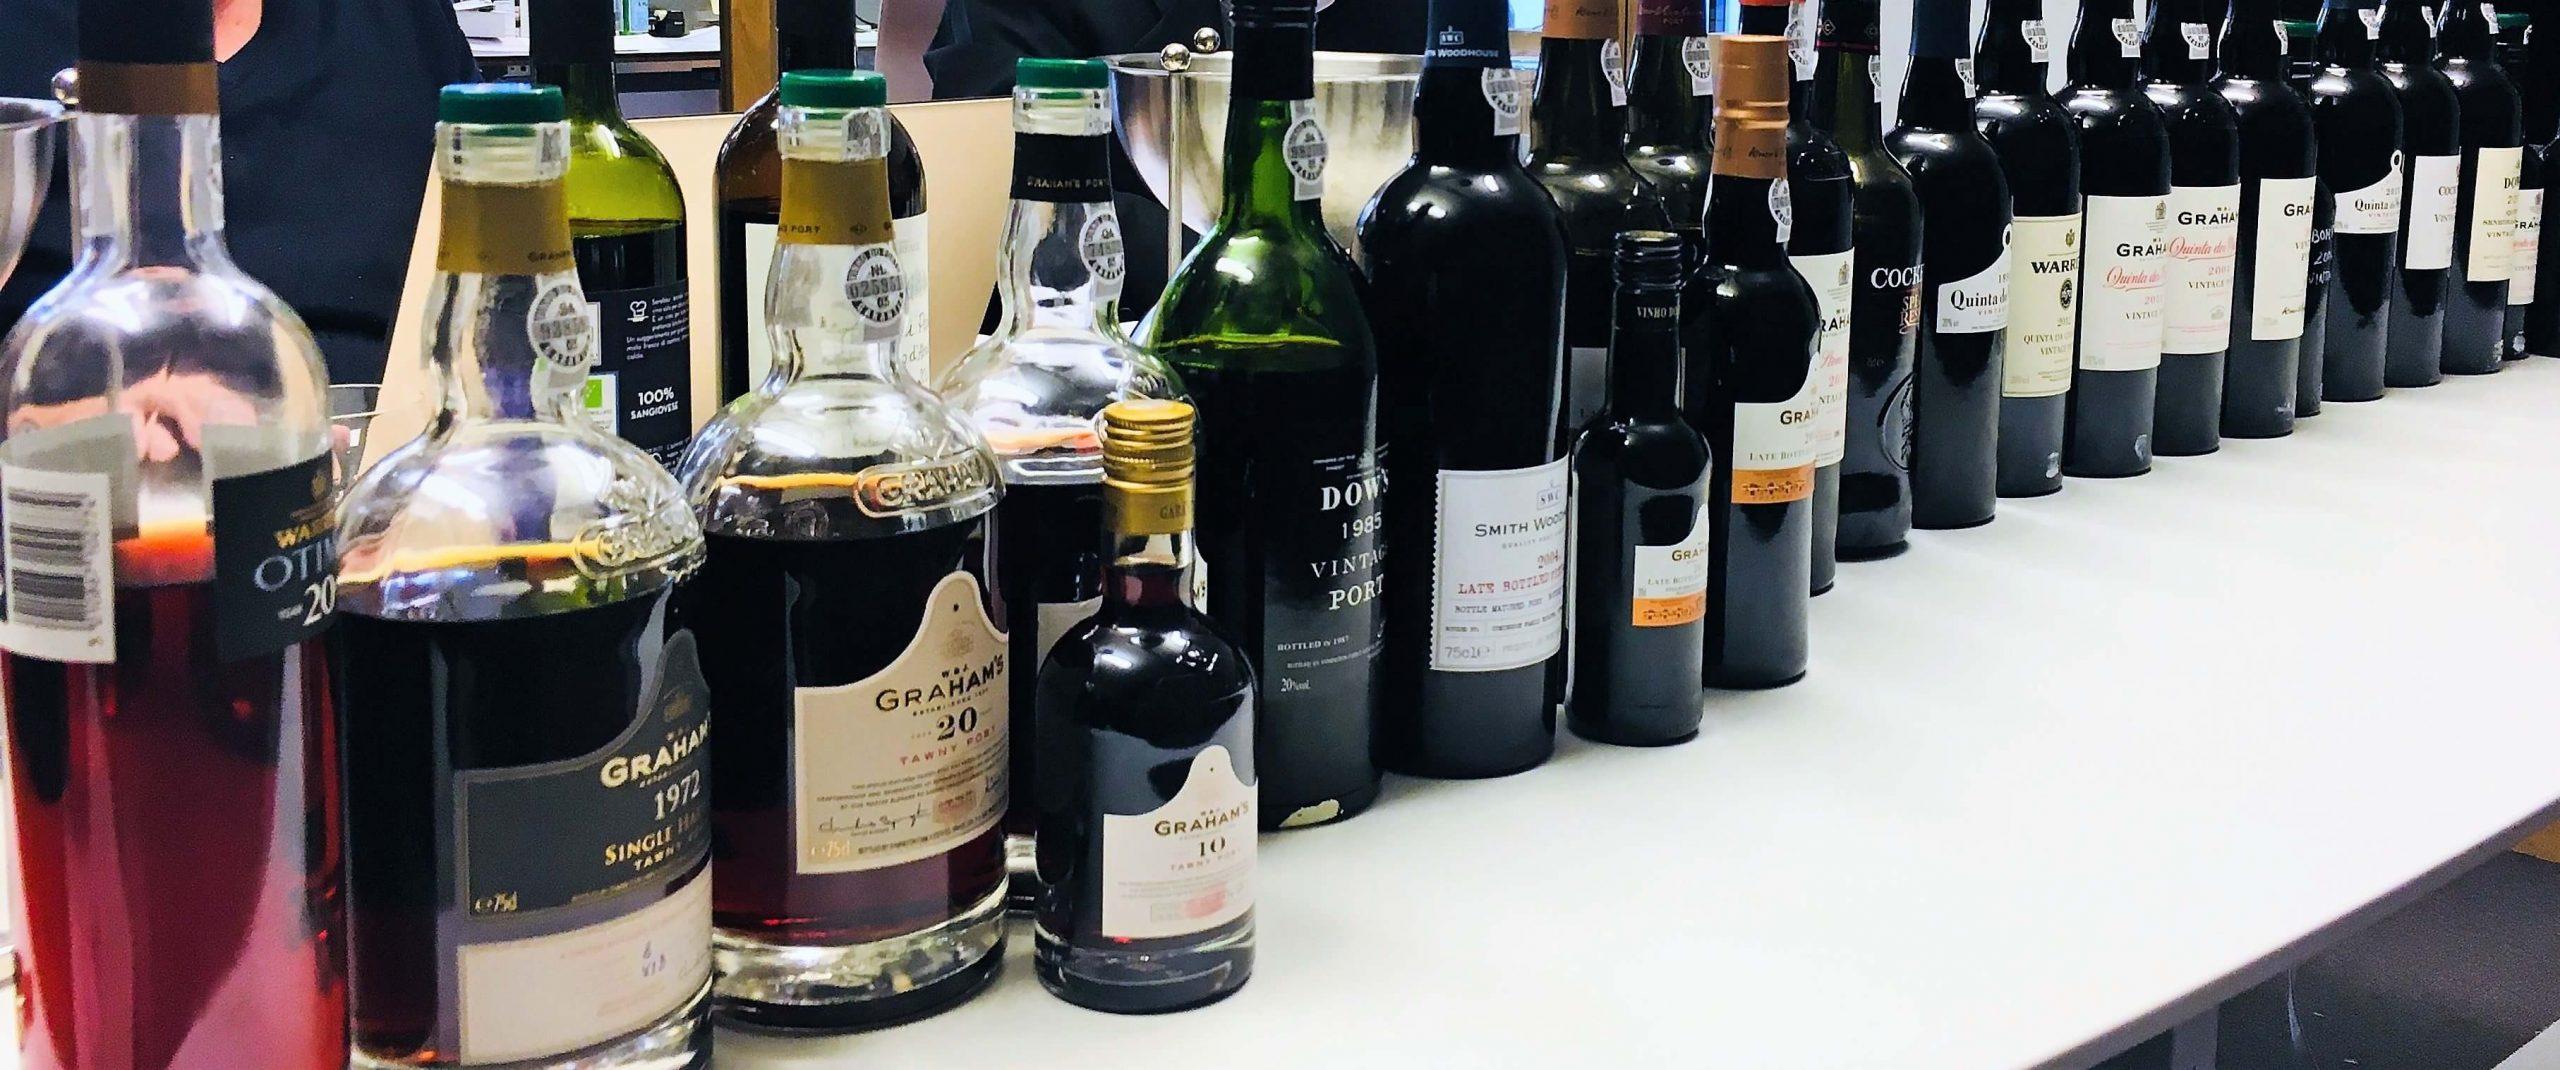 Endelig portvinsesong – 10 portvin til jul